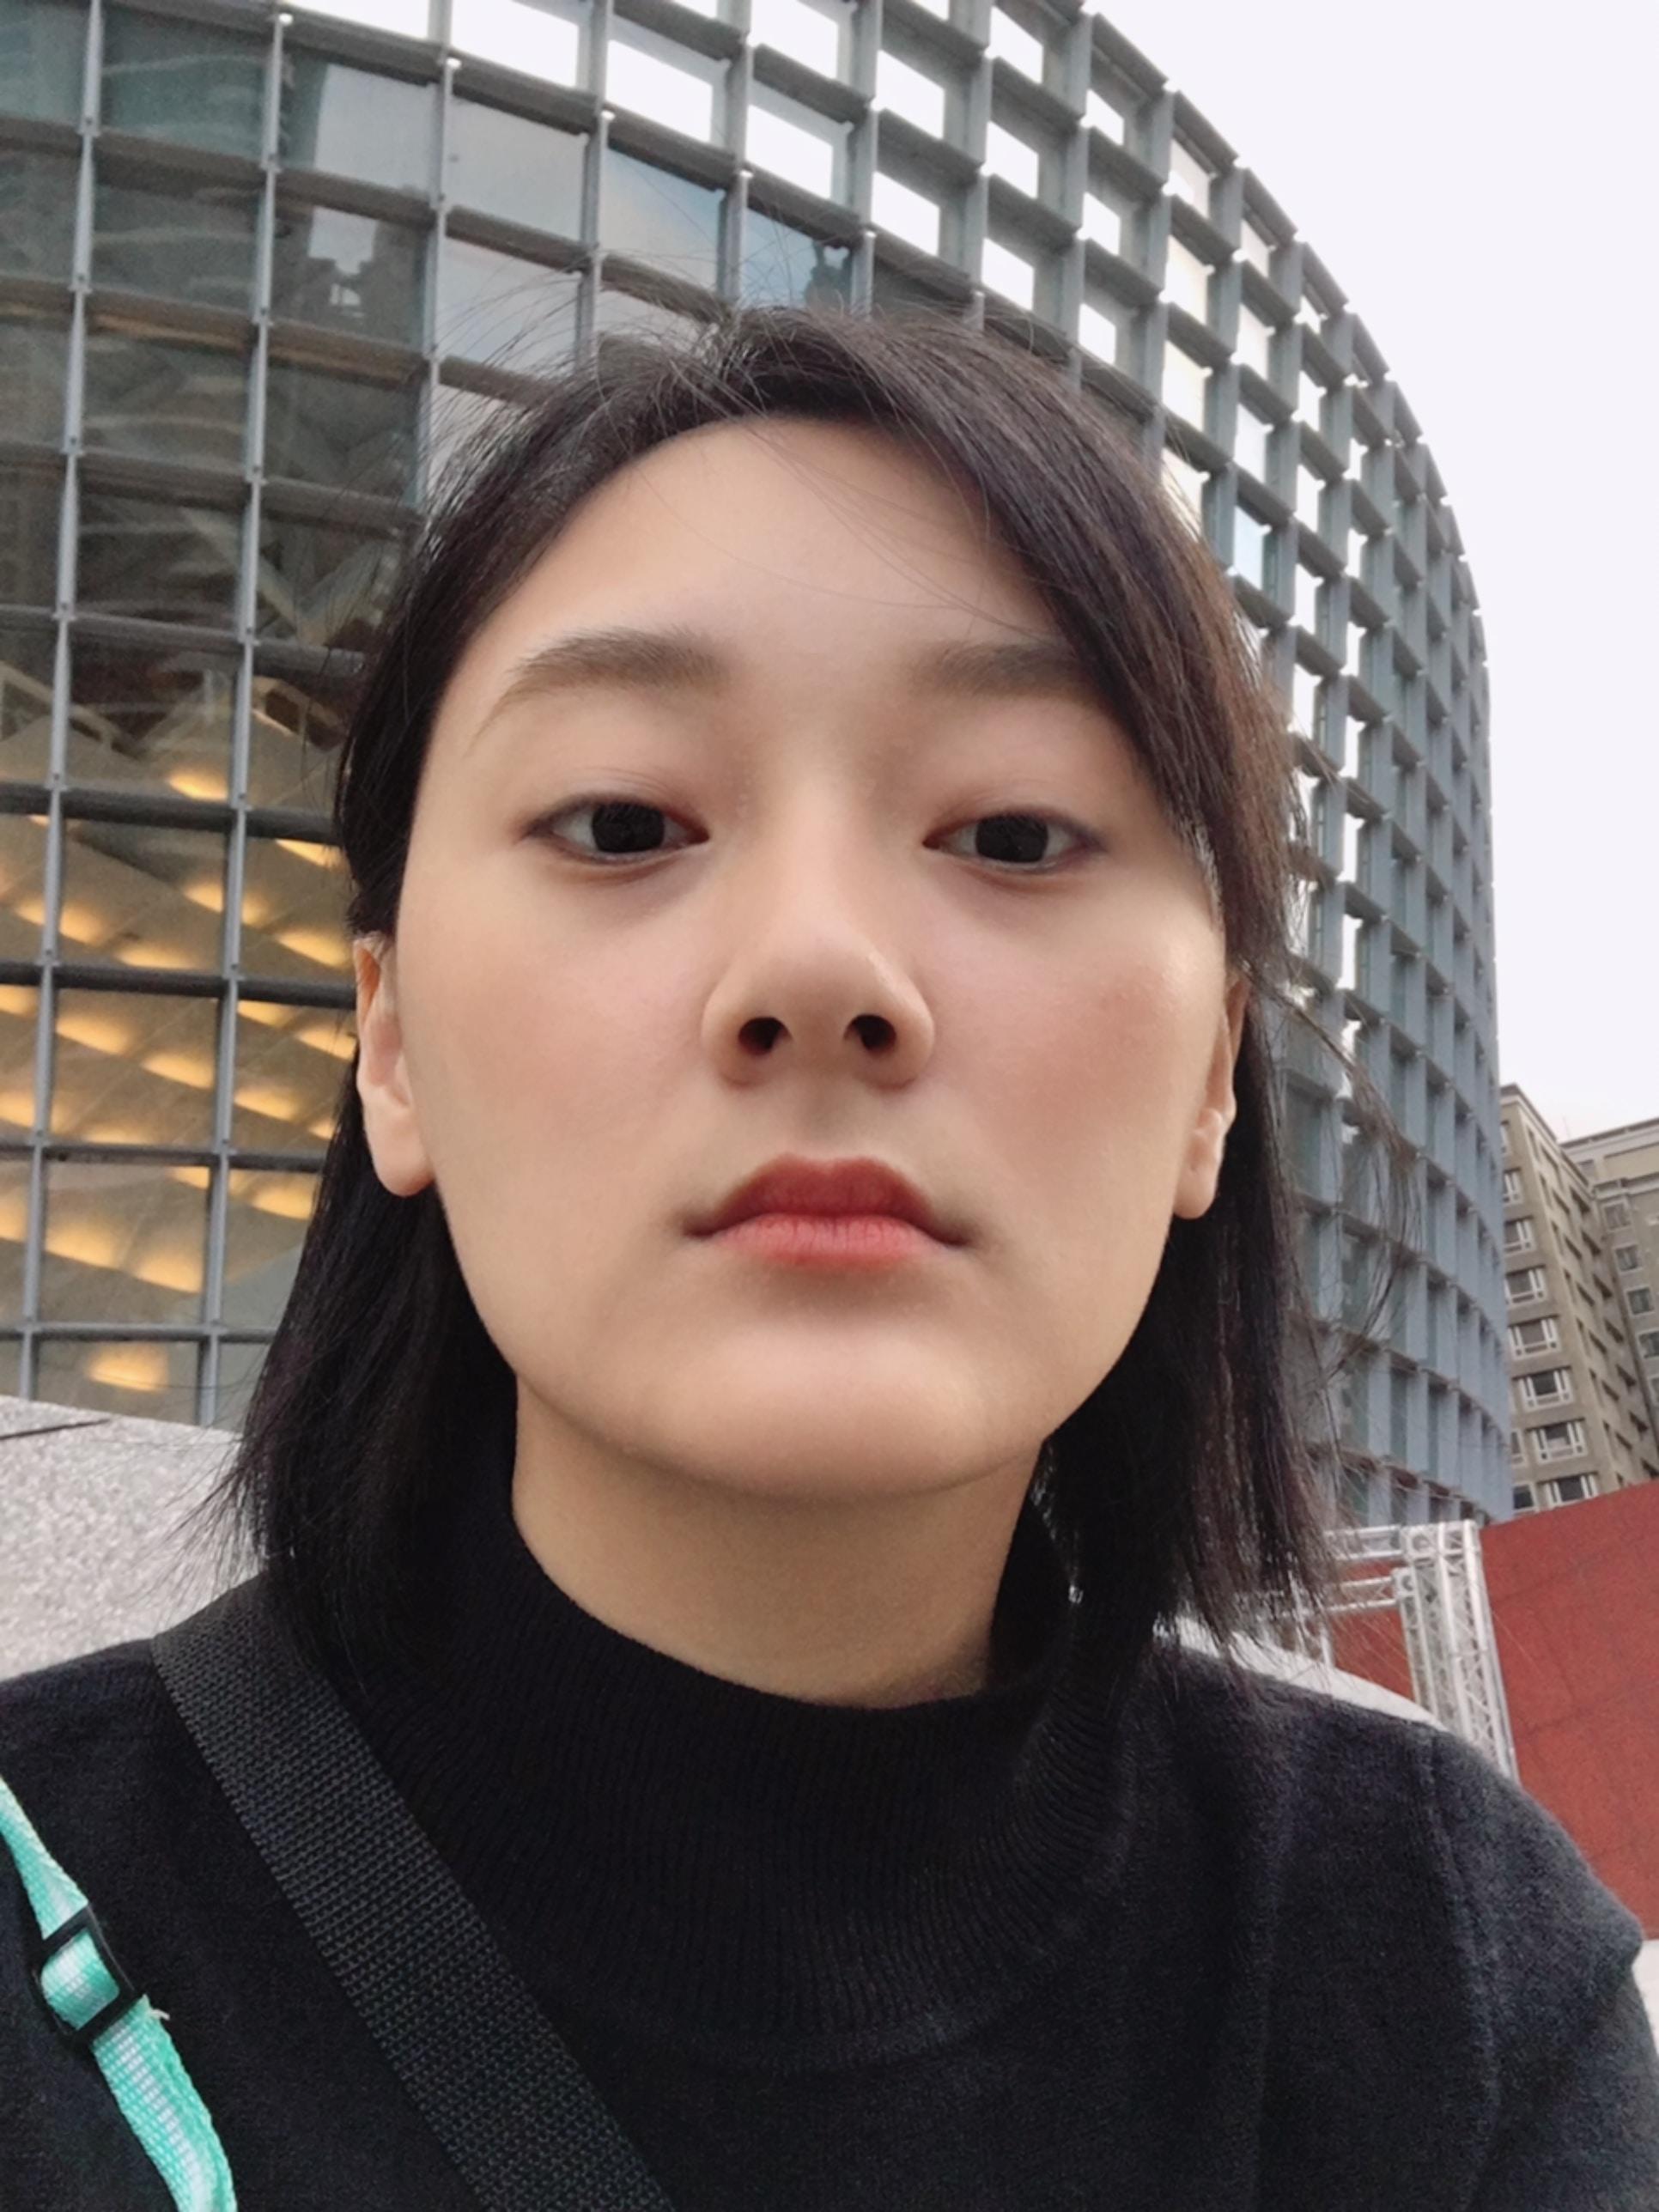 Go to mandy zhu's profile